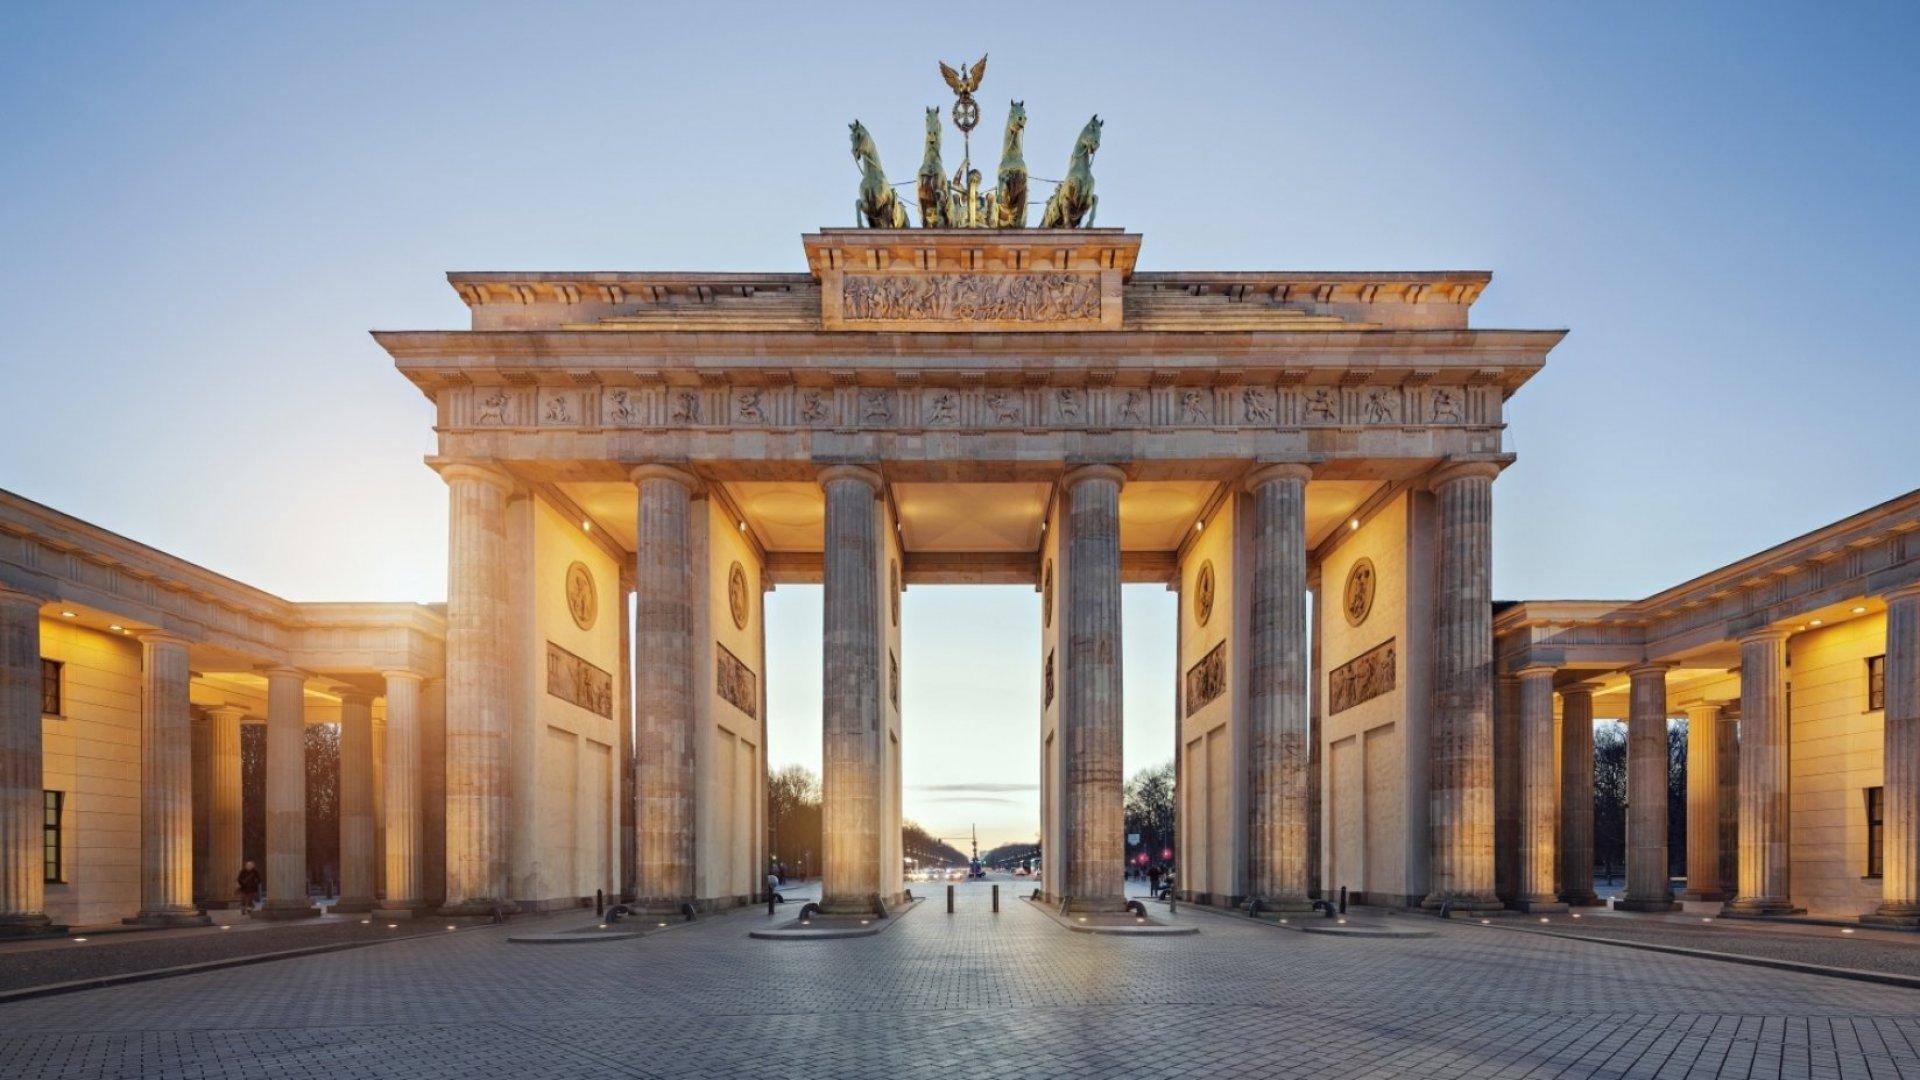 Berlin's Brandenburg Gate.